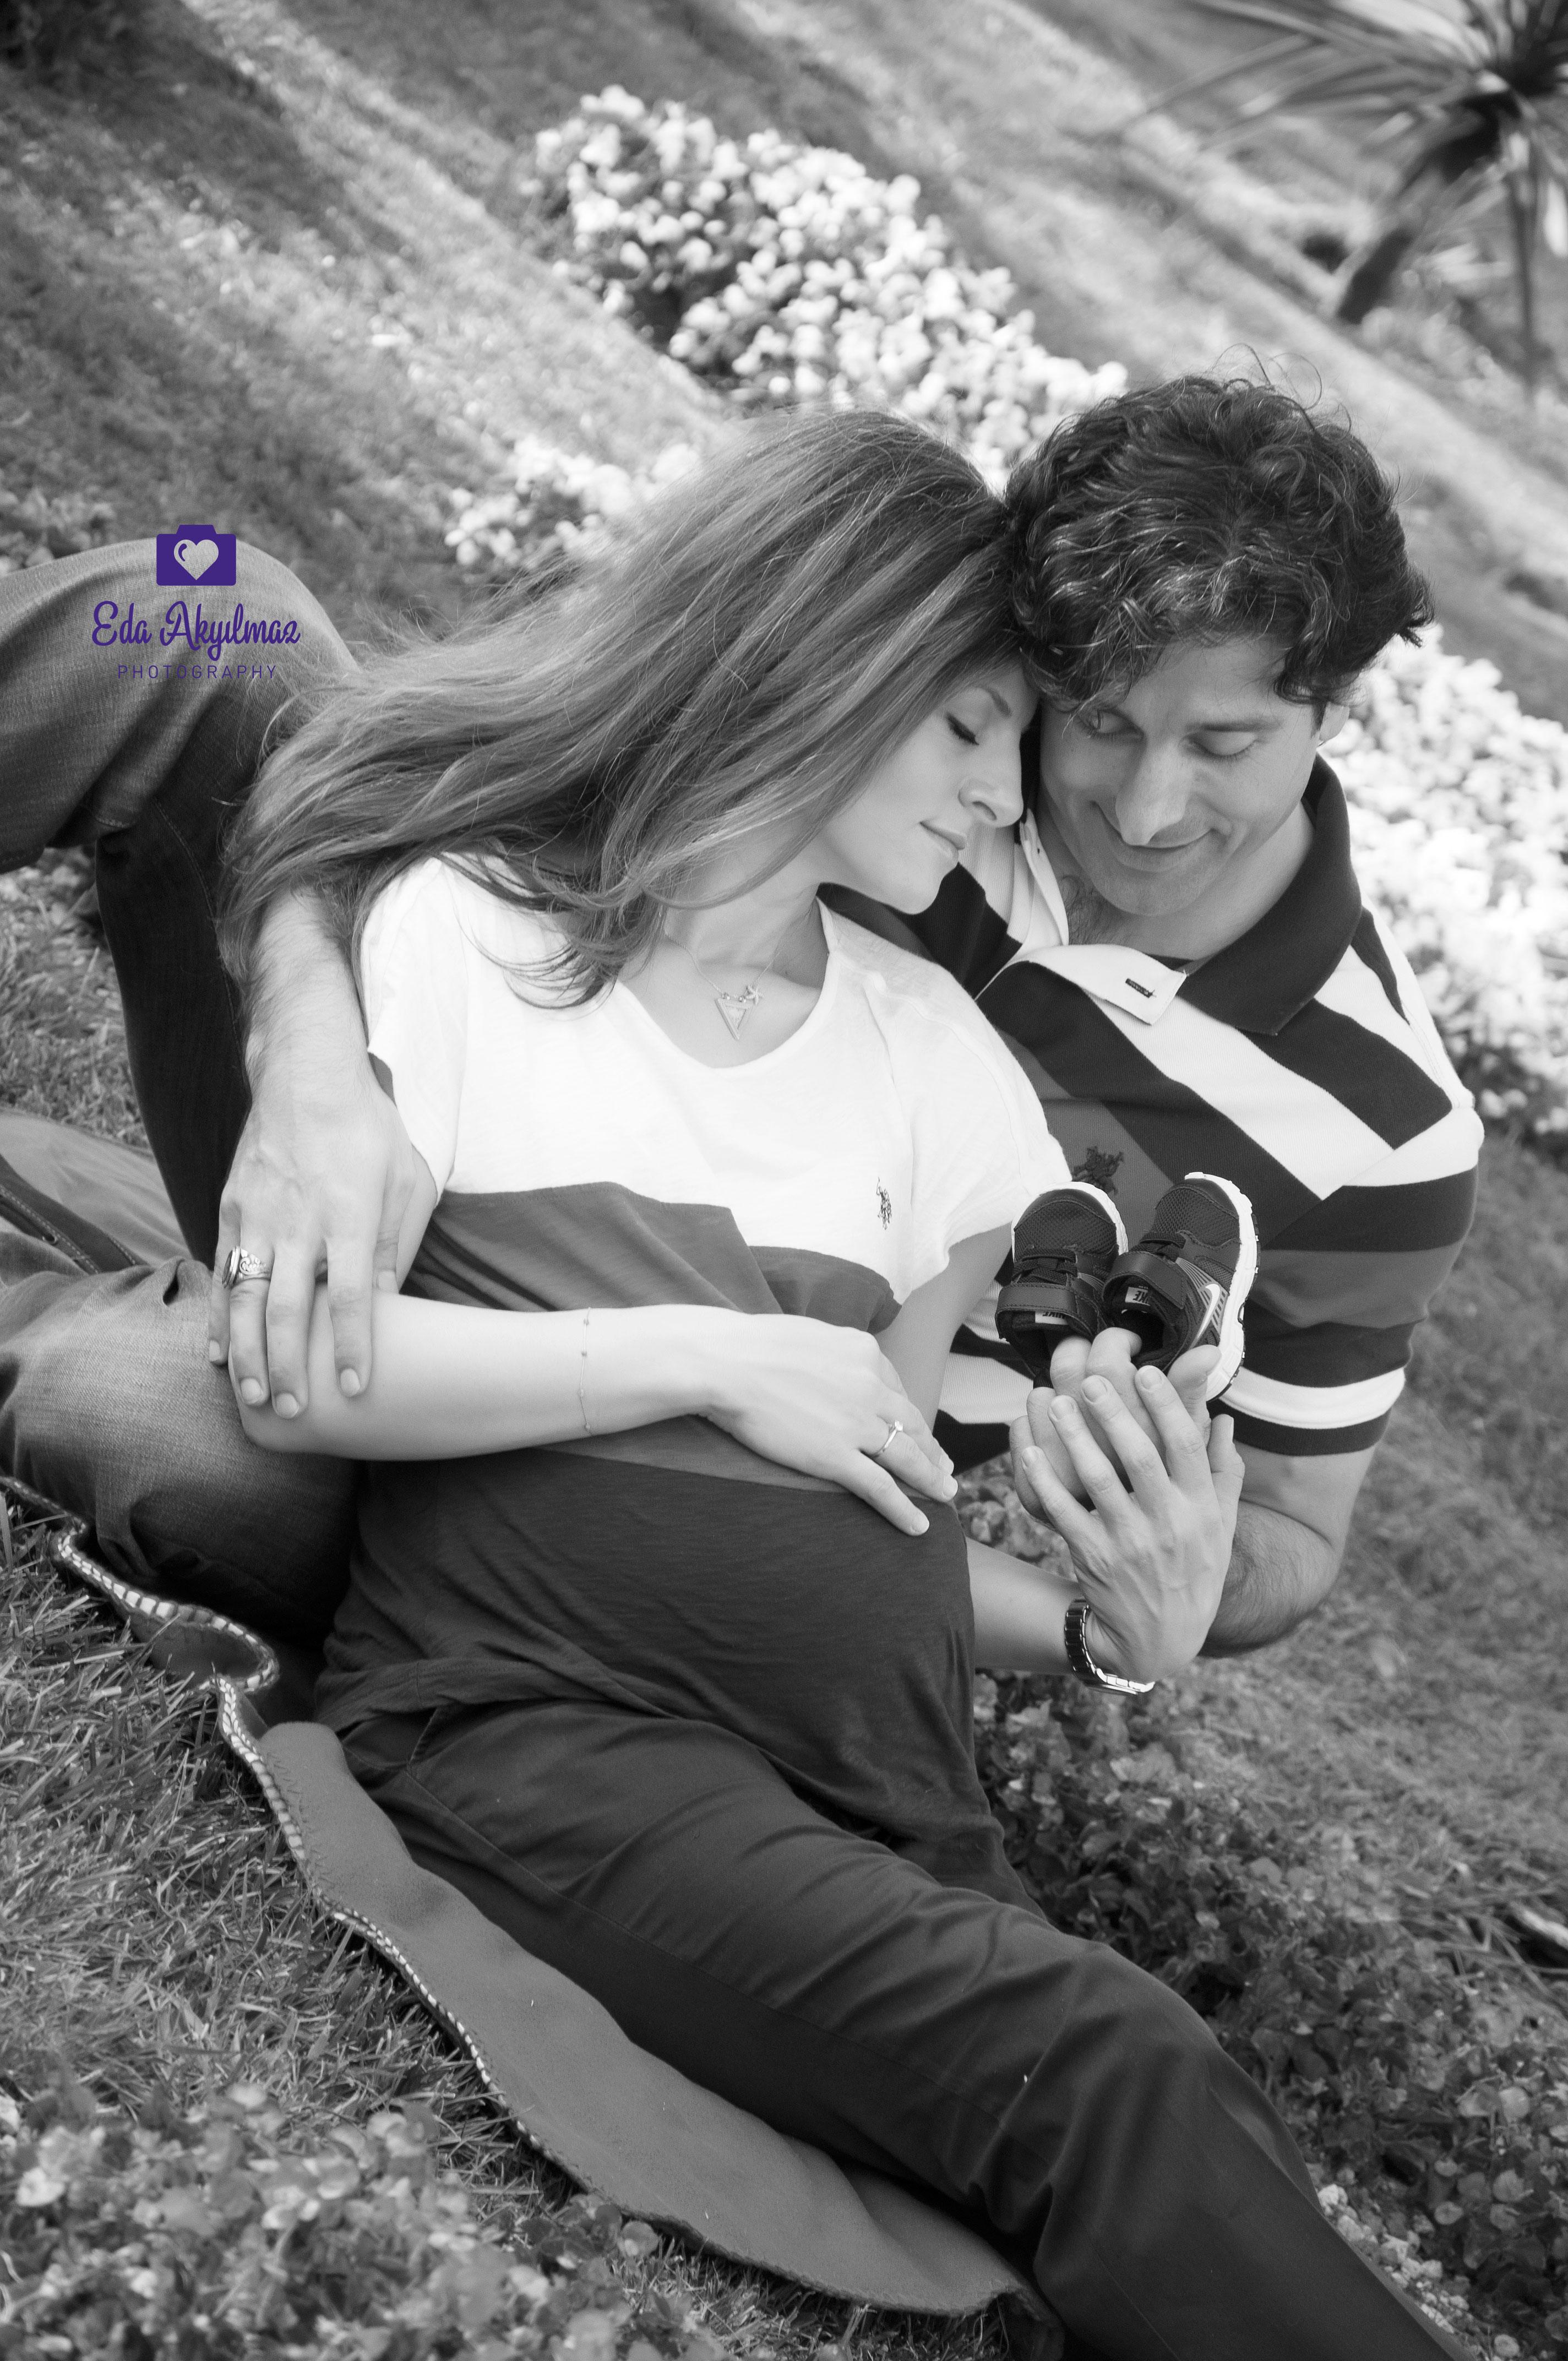 _hamile-fotograflari-eda-akyilmaz-DSC00093.jpg